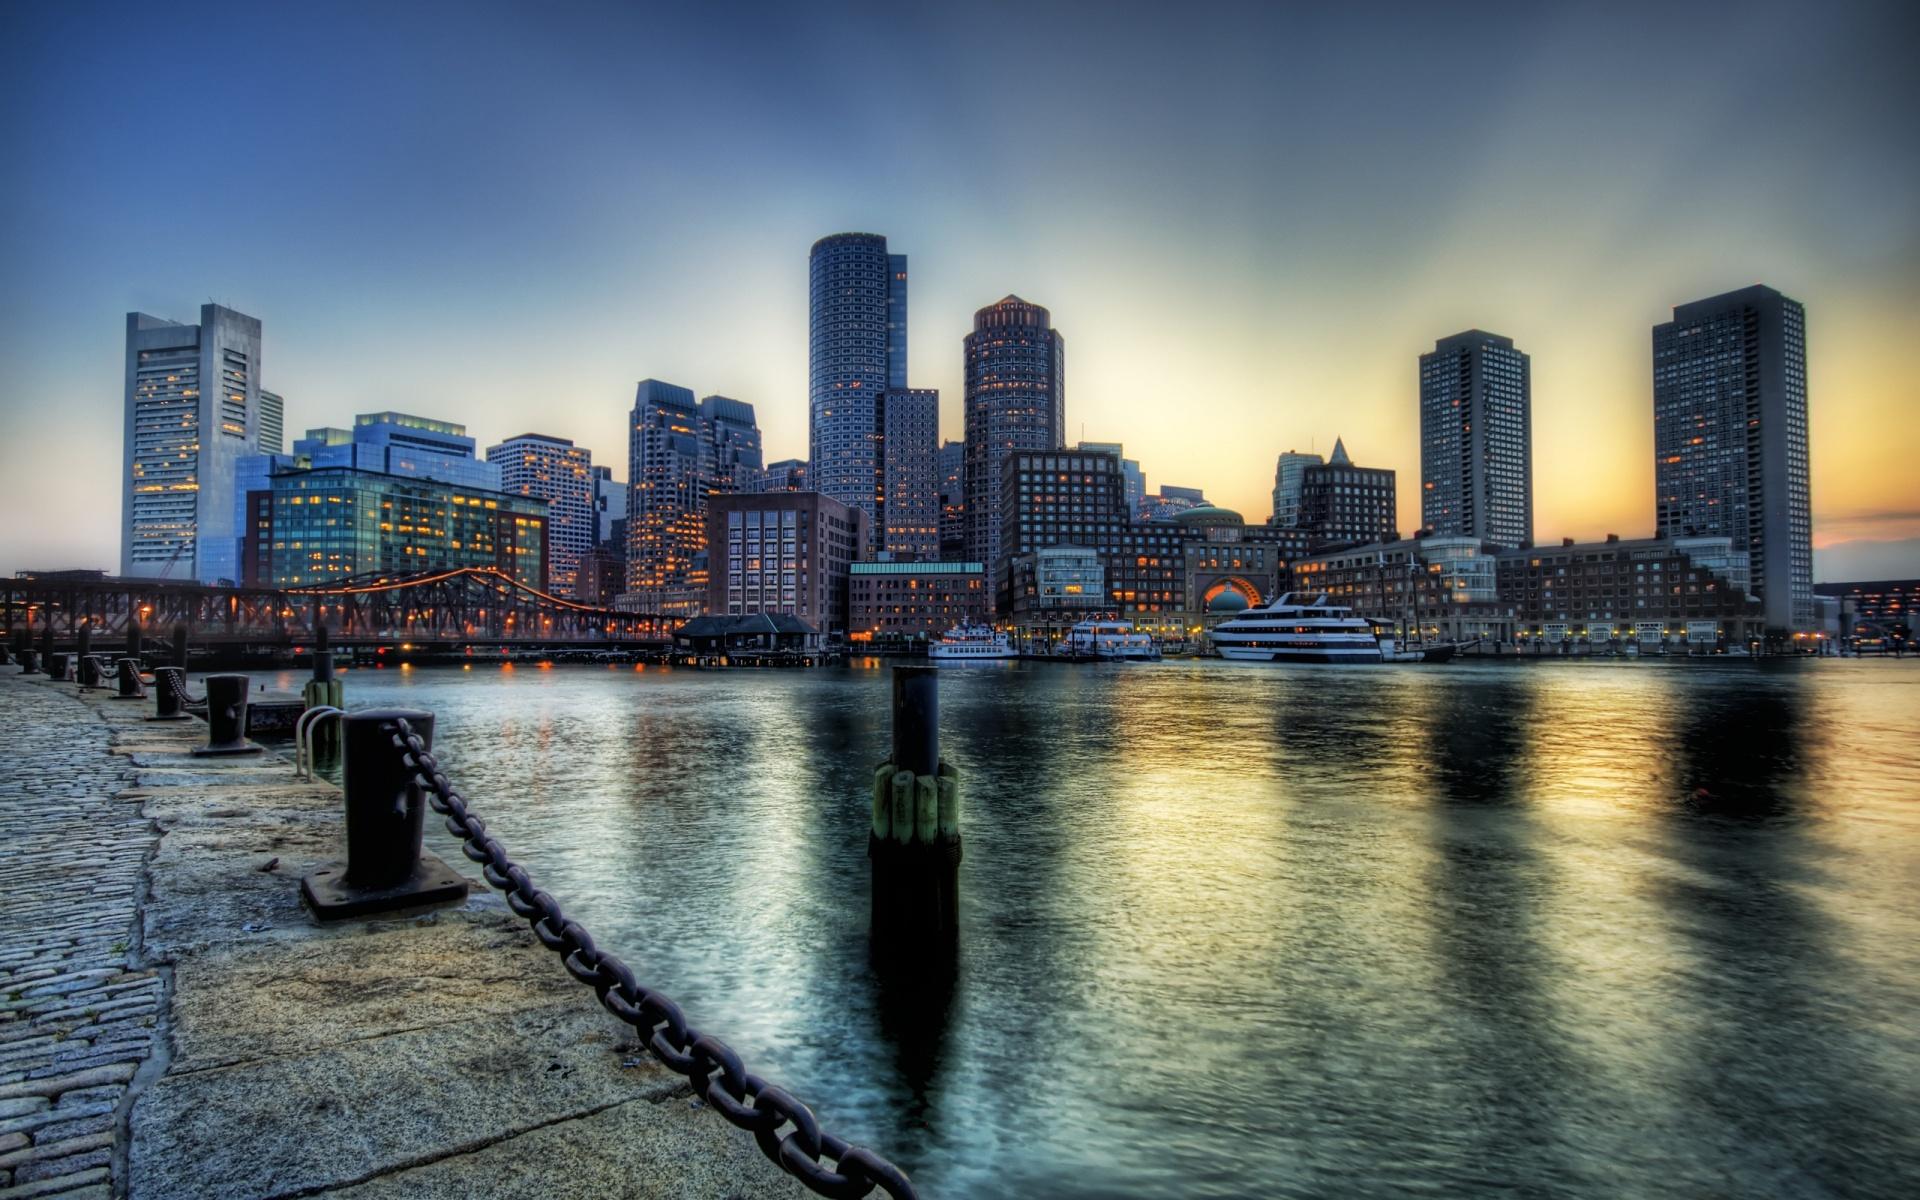 Boston City at Dusk Full HD Desktop Wallpapers 1080p 1920x1200